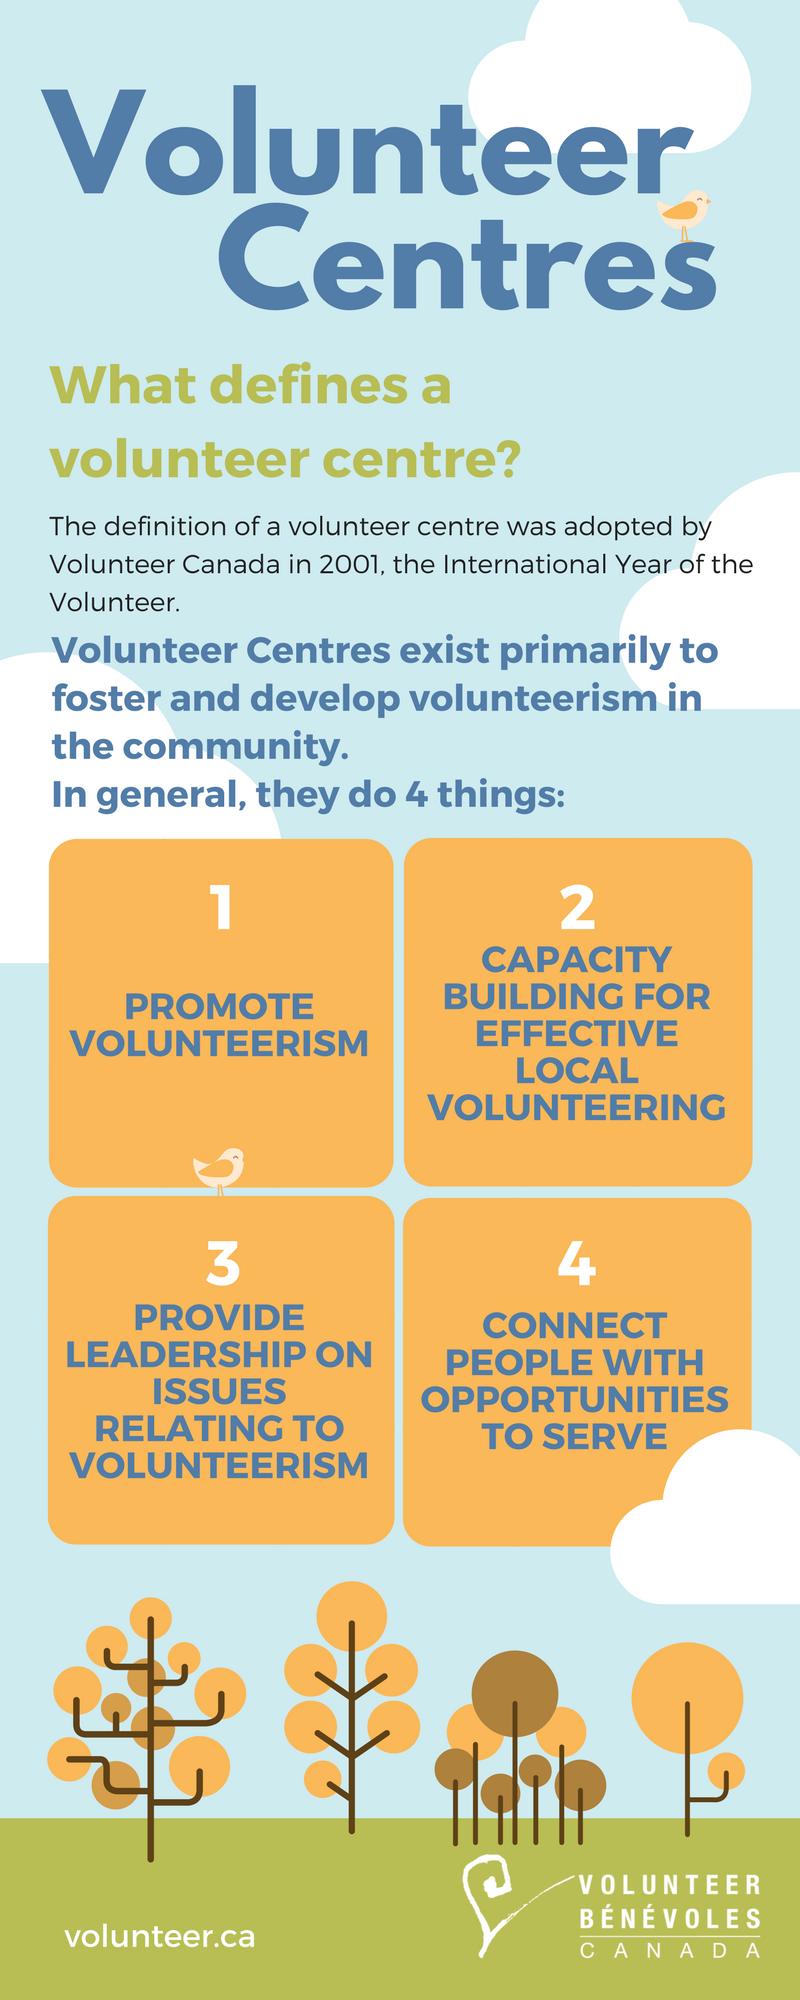 Volunteer Centres - I Want to Volunteer - Volunteer Canada